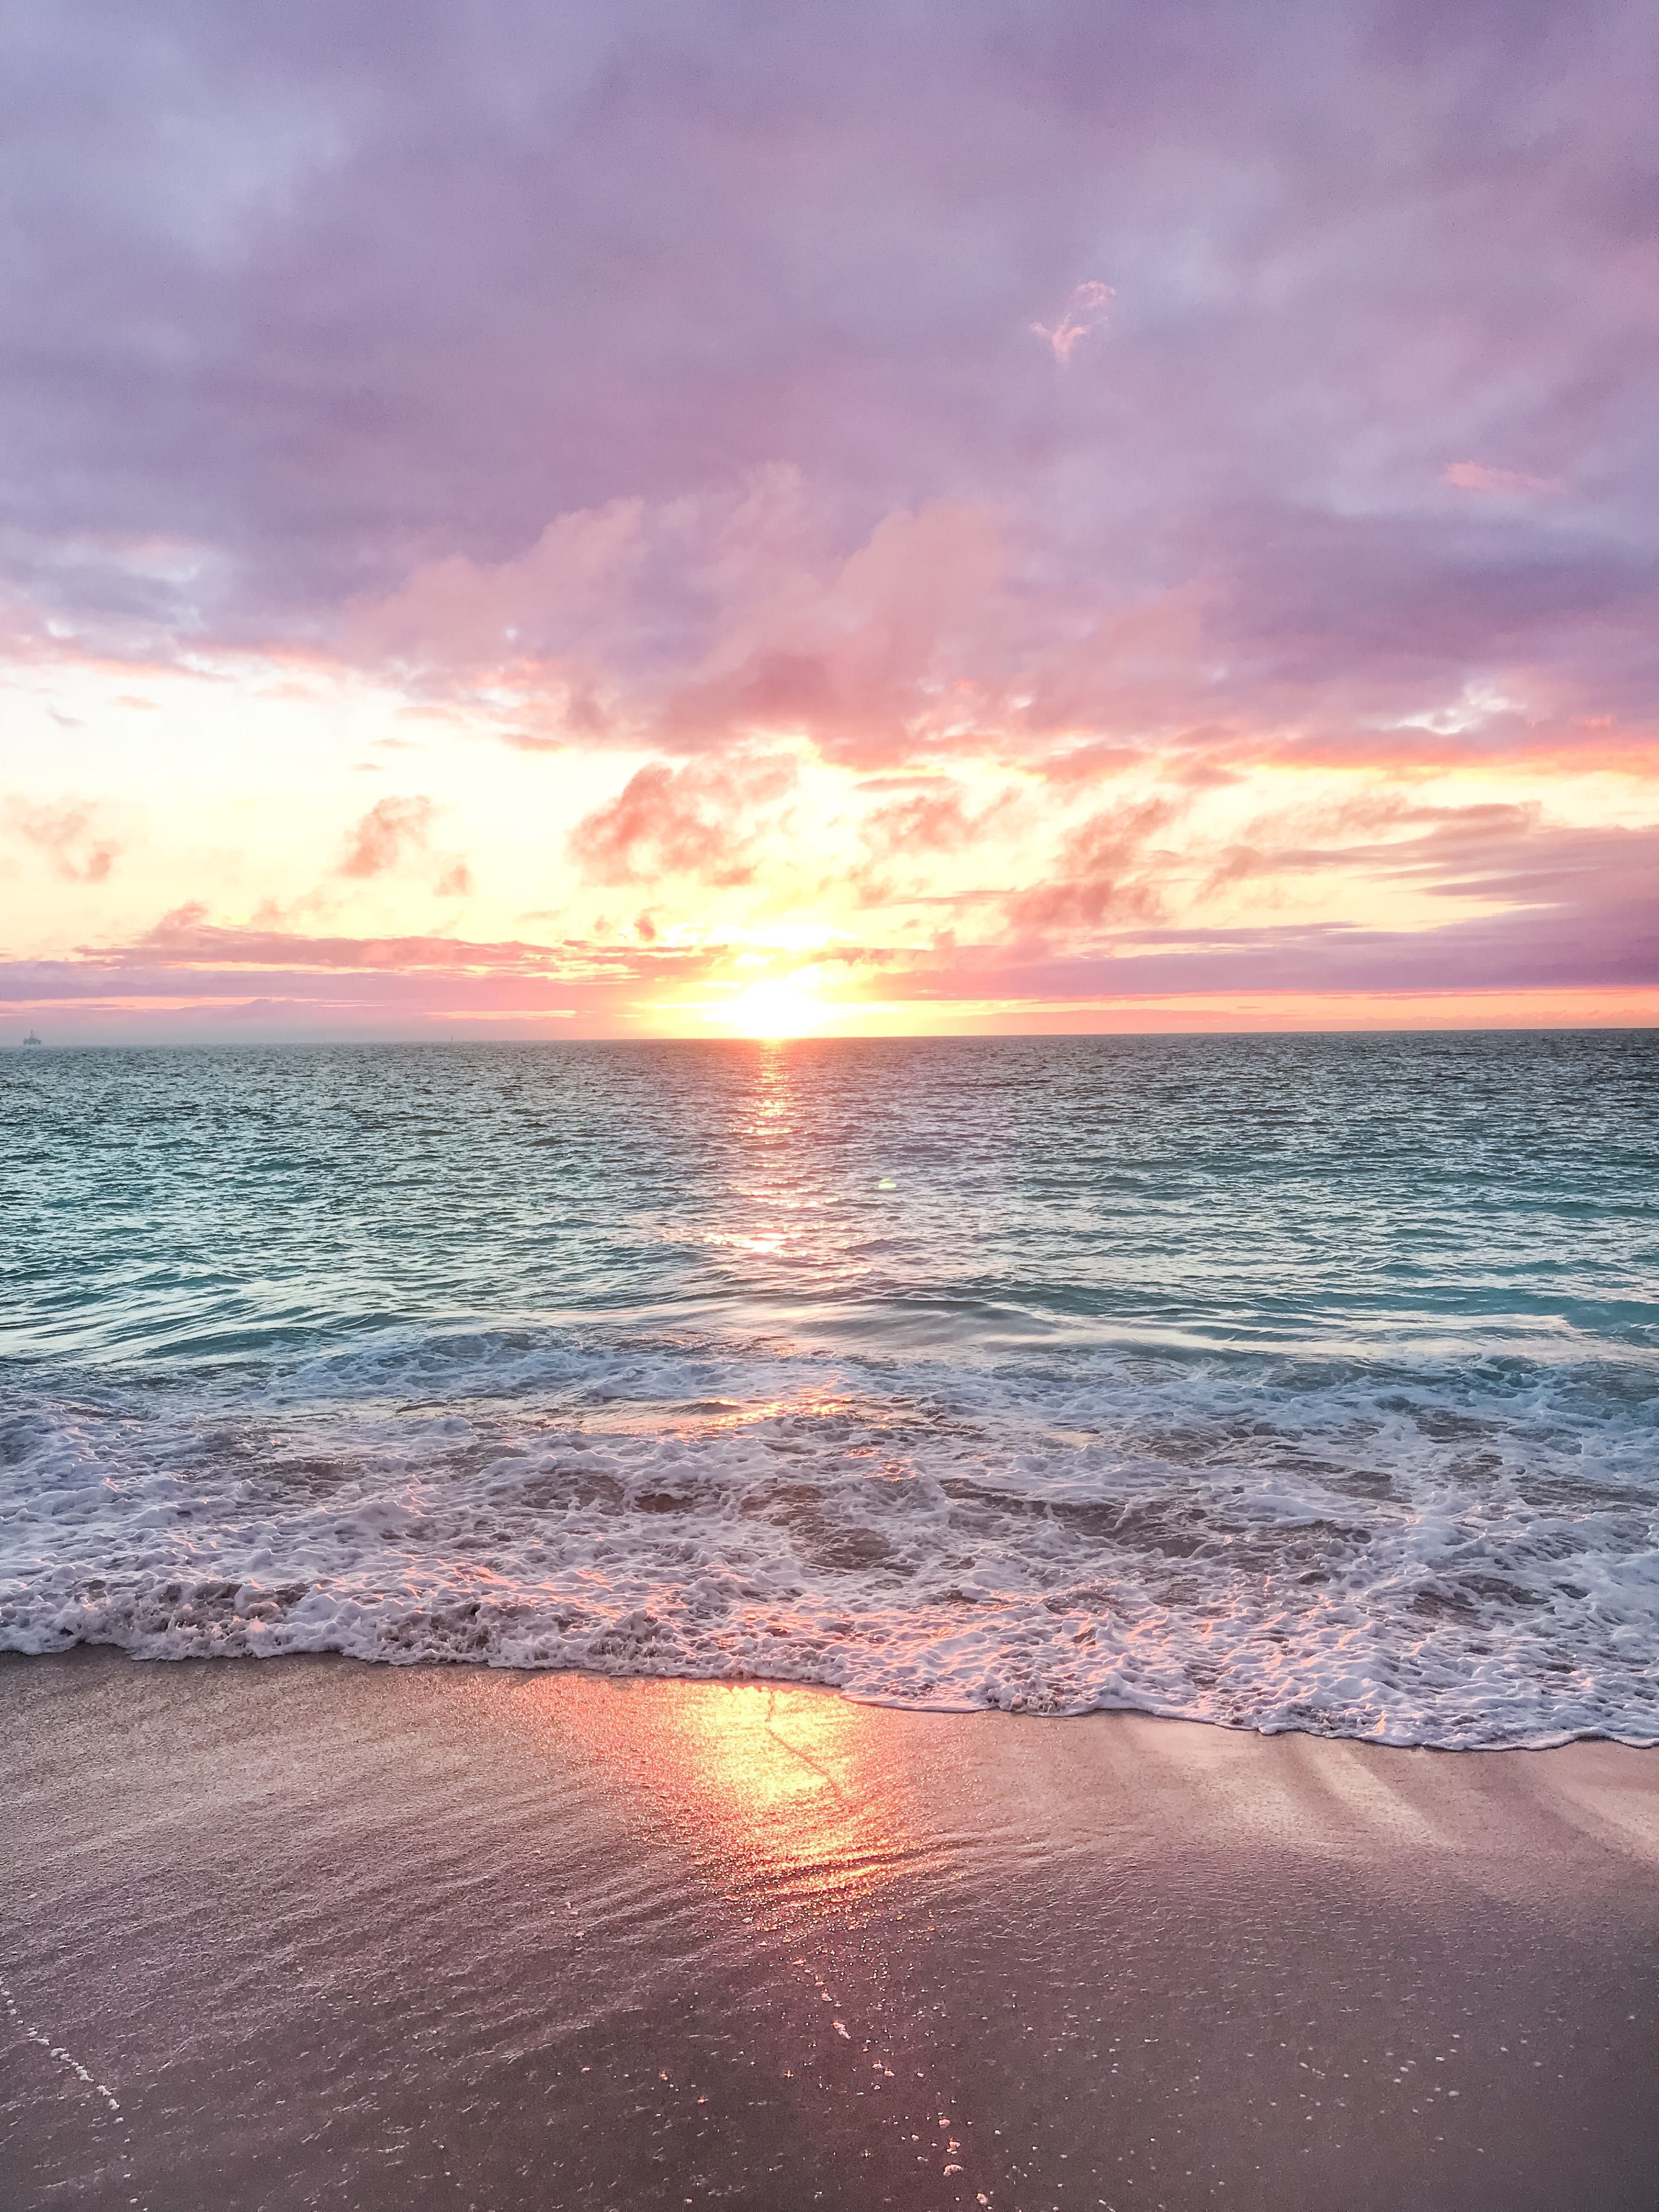 Gypsylovinlight North Beach Wa Pcnorth Beach Wa Pc Gypsylovinlight Beach Wallpaper Ocean Wallpaper Sunset Wallpaper